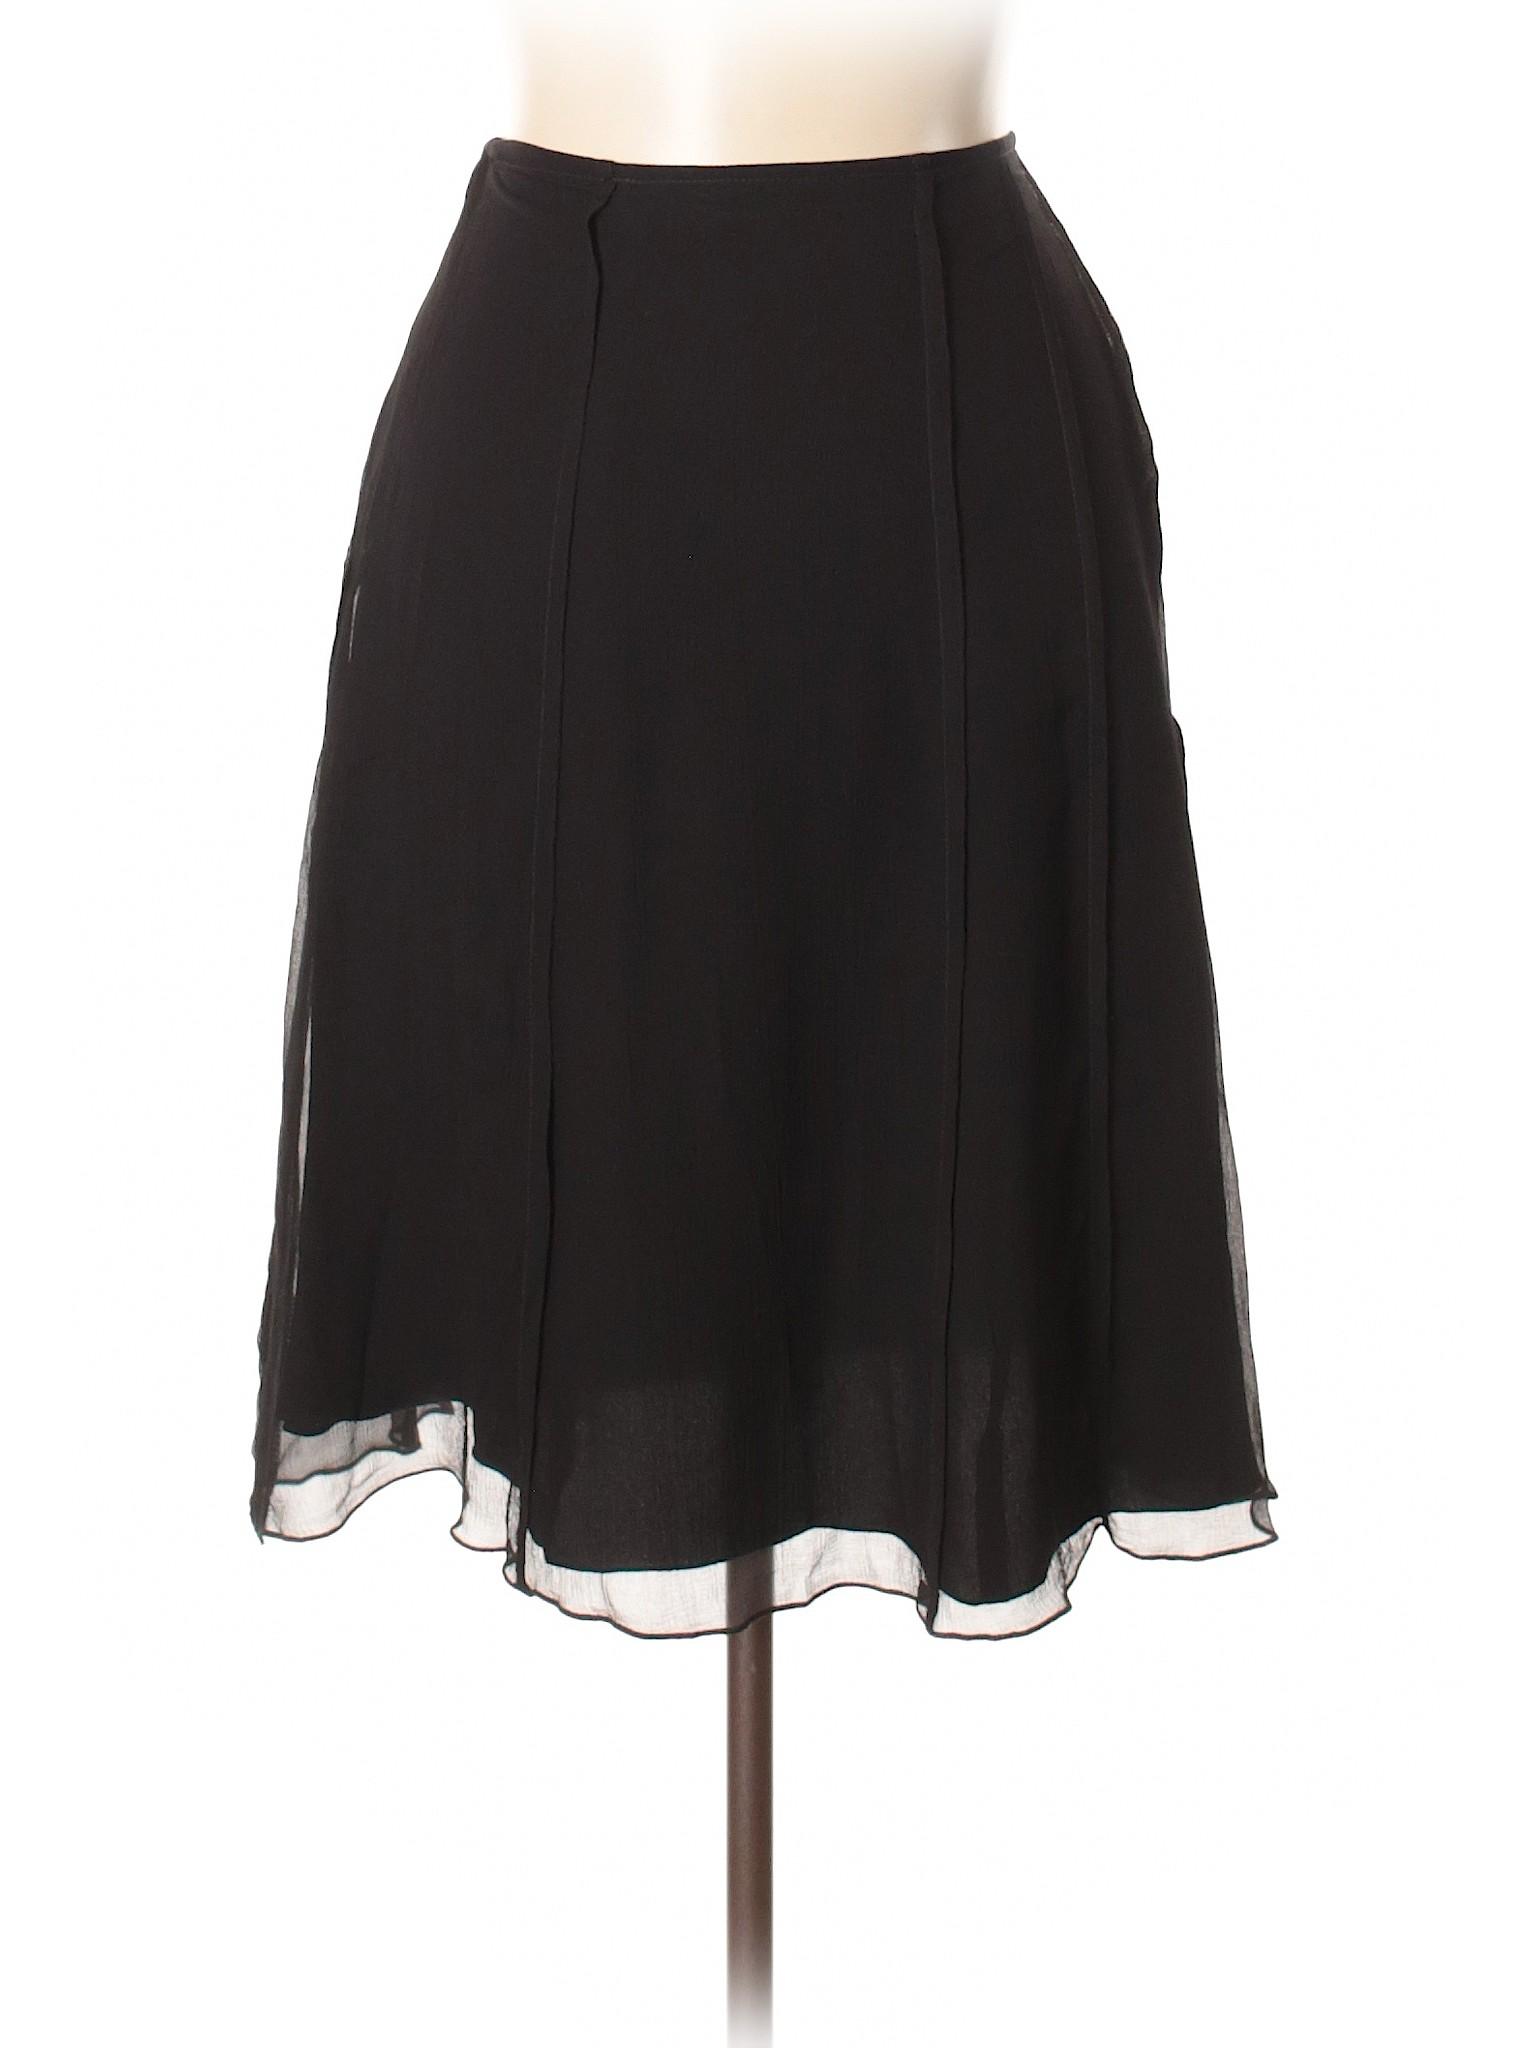 Boutique GUNEX Casual Skirt Boutique GUNEX Casual APzrwqRA